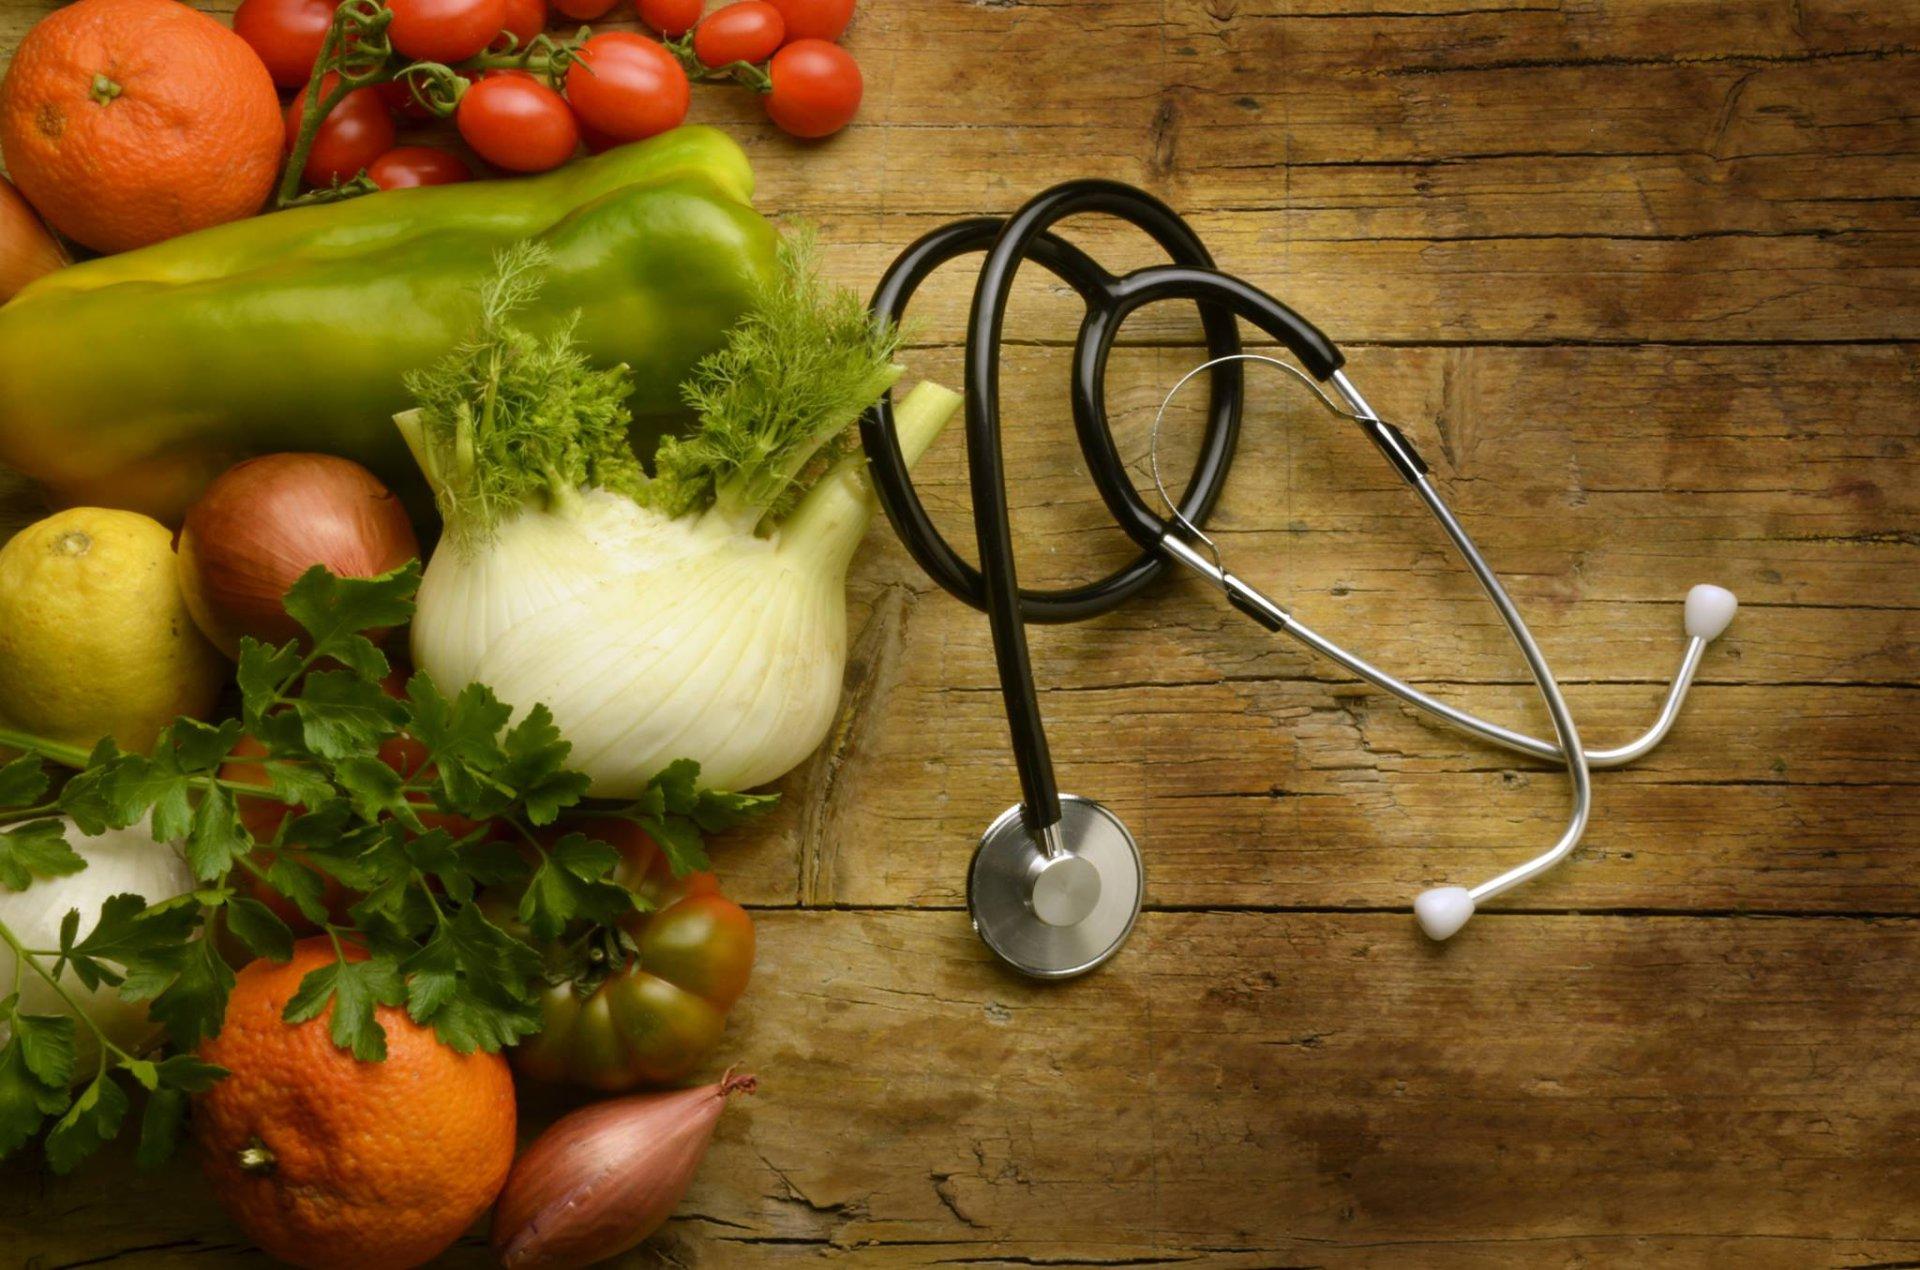 Tinkama dieta per savaitę su hipertenzija: meniu - Aterosklerozė November